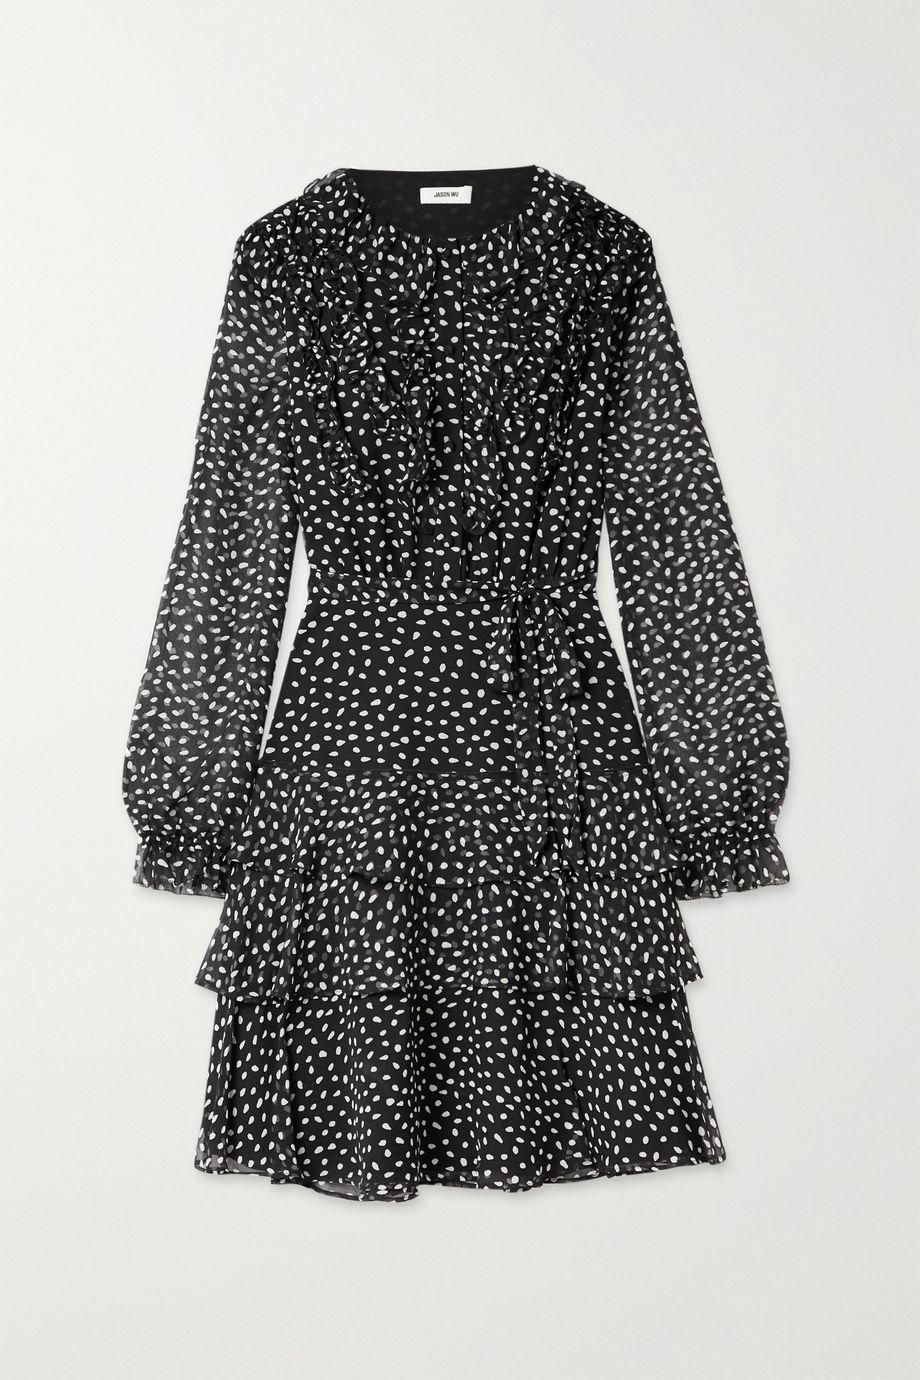 Jason Wu Belted ruffled polka-dot silk-crepon dress